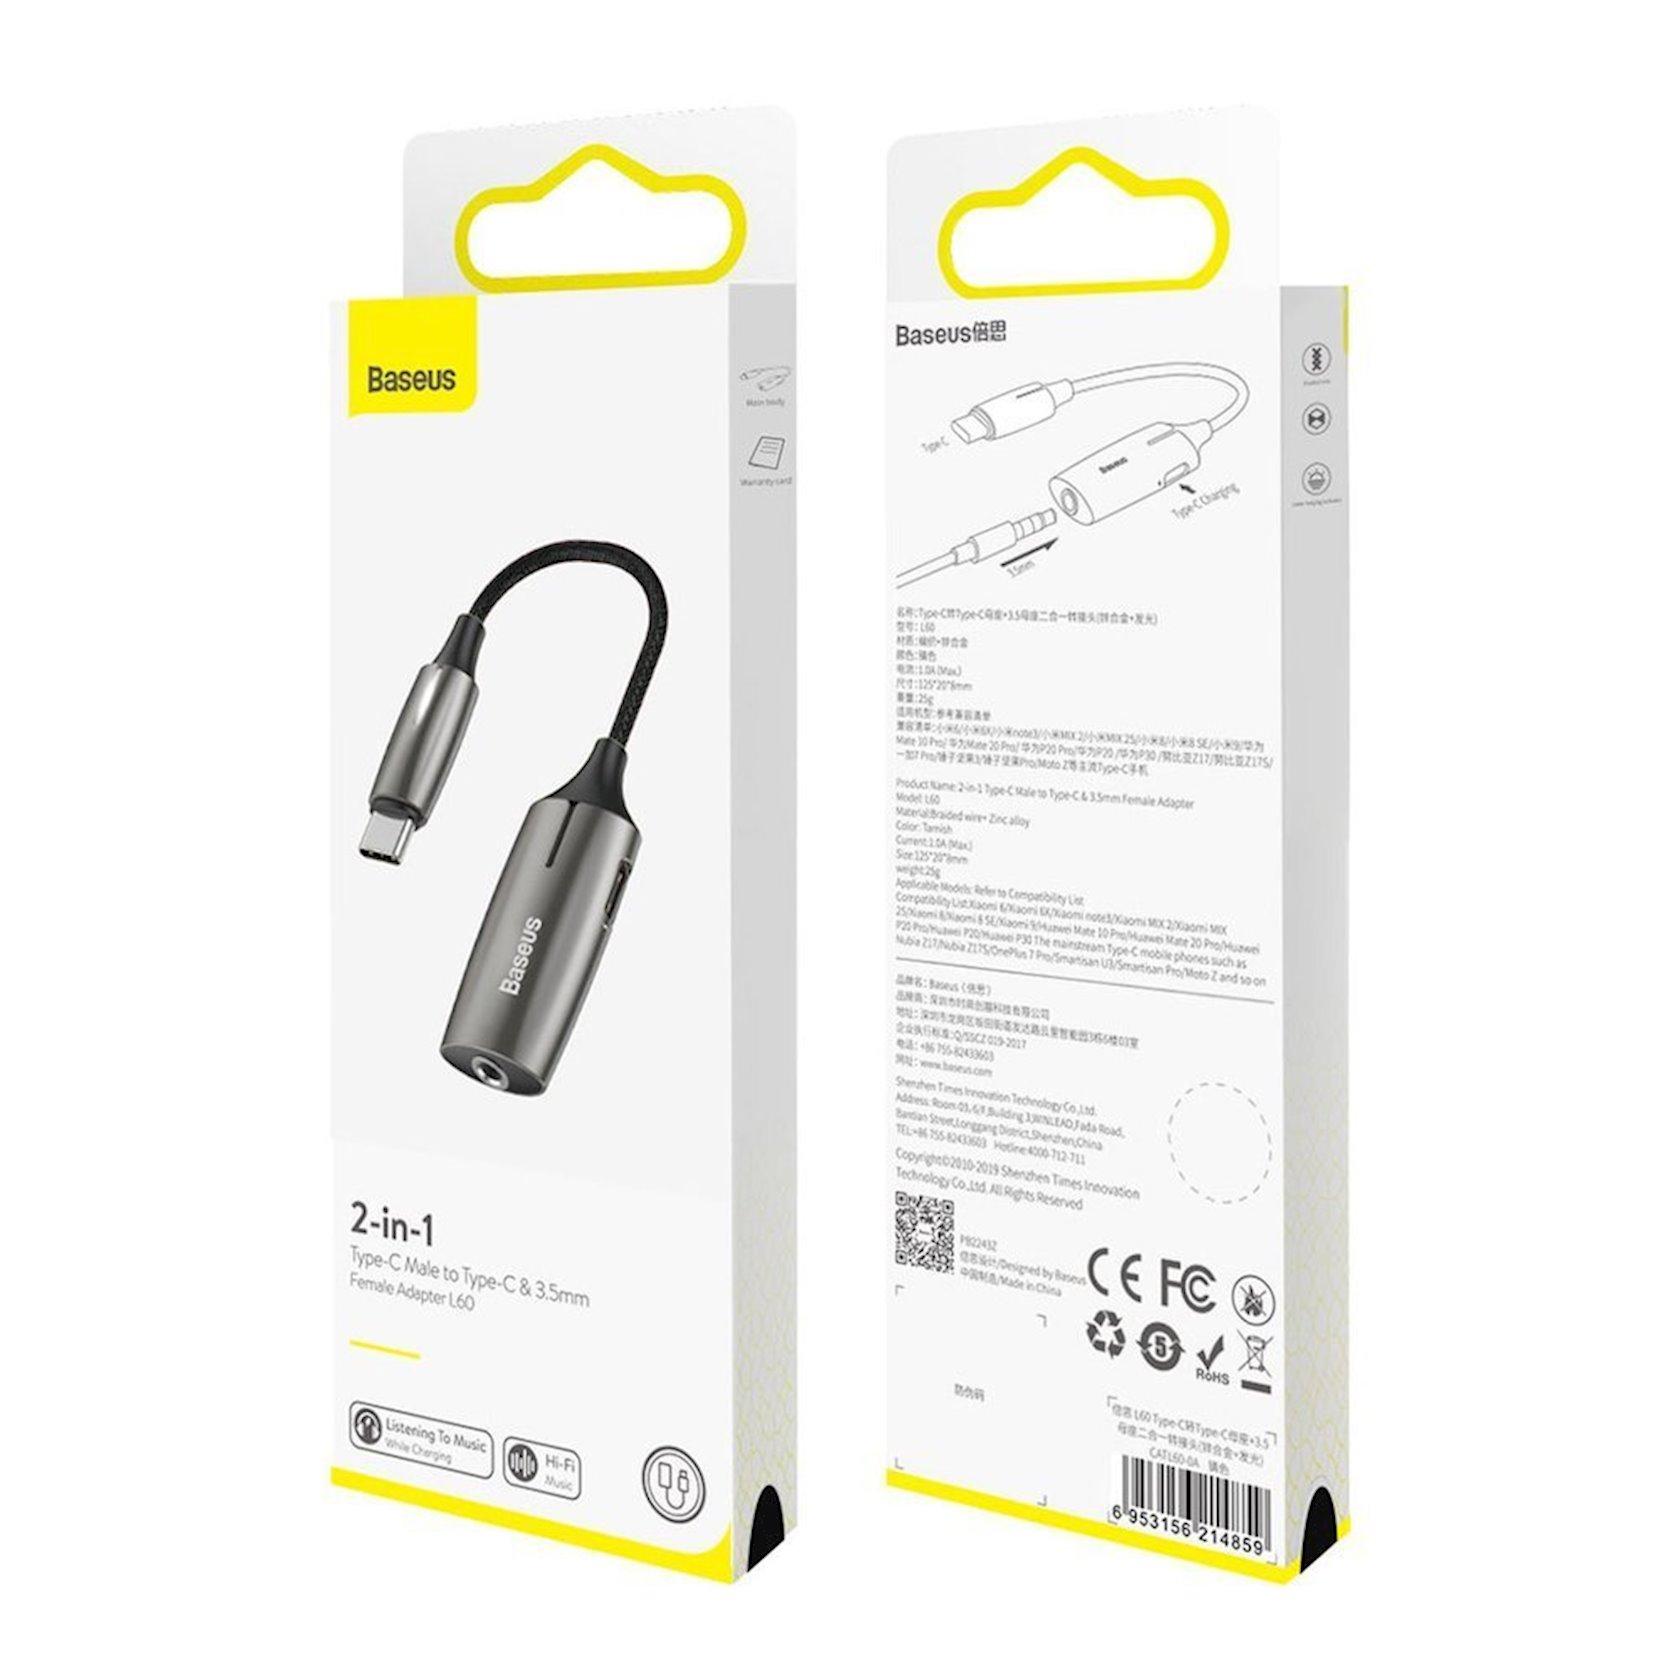 Ötürücü Baseus Audio converter L60 adapter from USB type C to USB type C (female) + headphones jack 3, 5 mm (female) black (CATL60-0A)